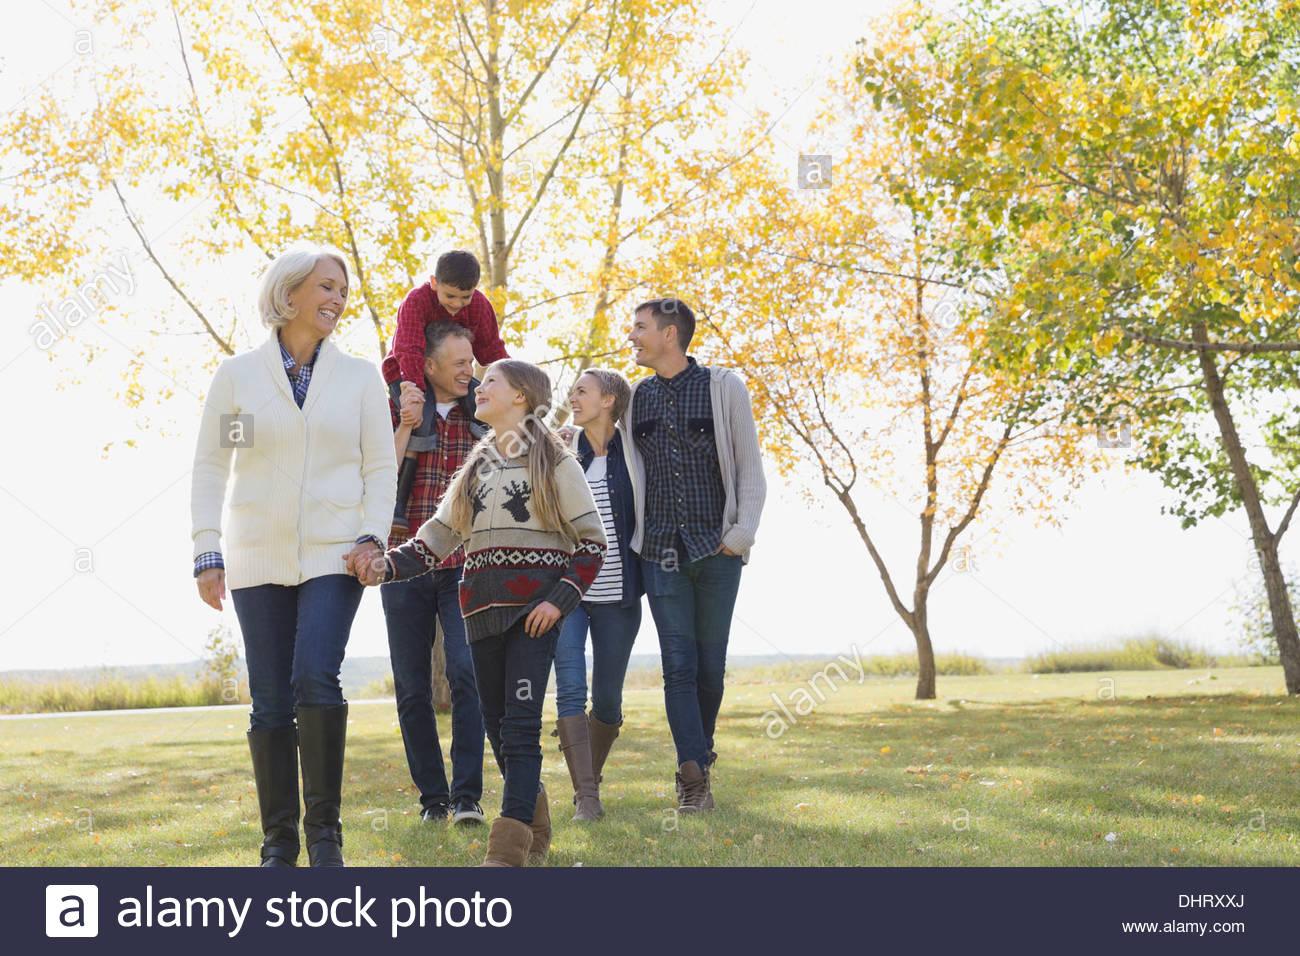 Happy multi-generation family walking in park - Stock Image